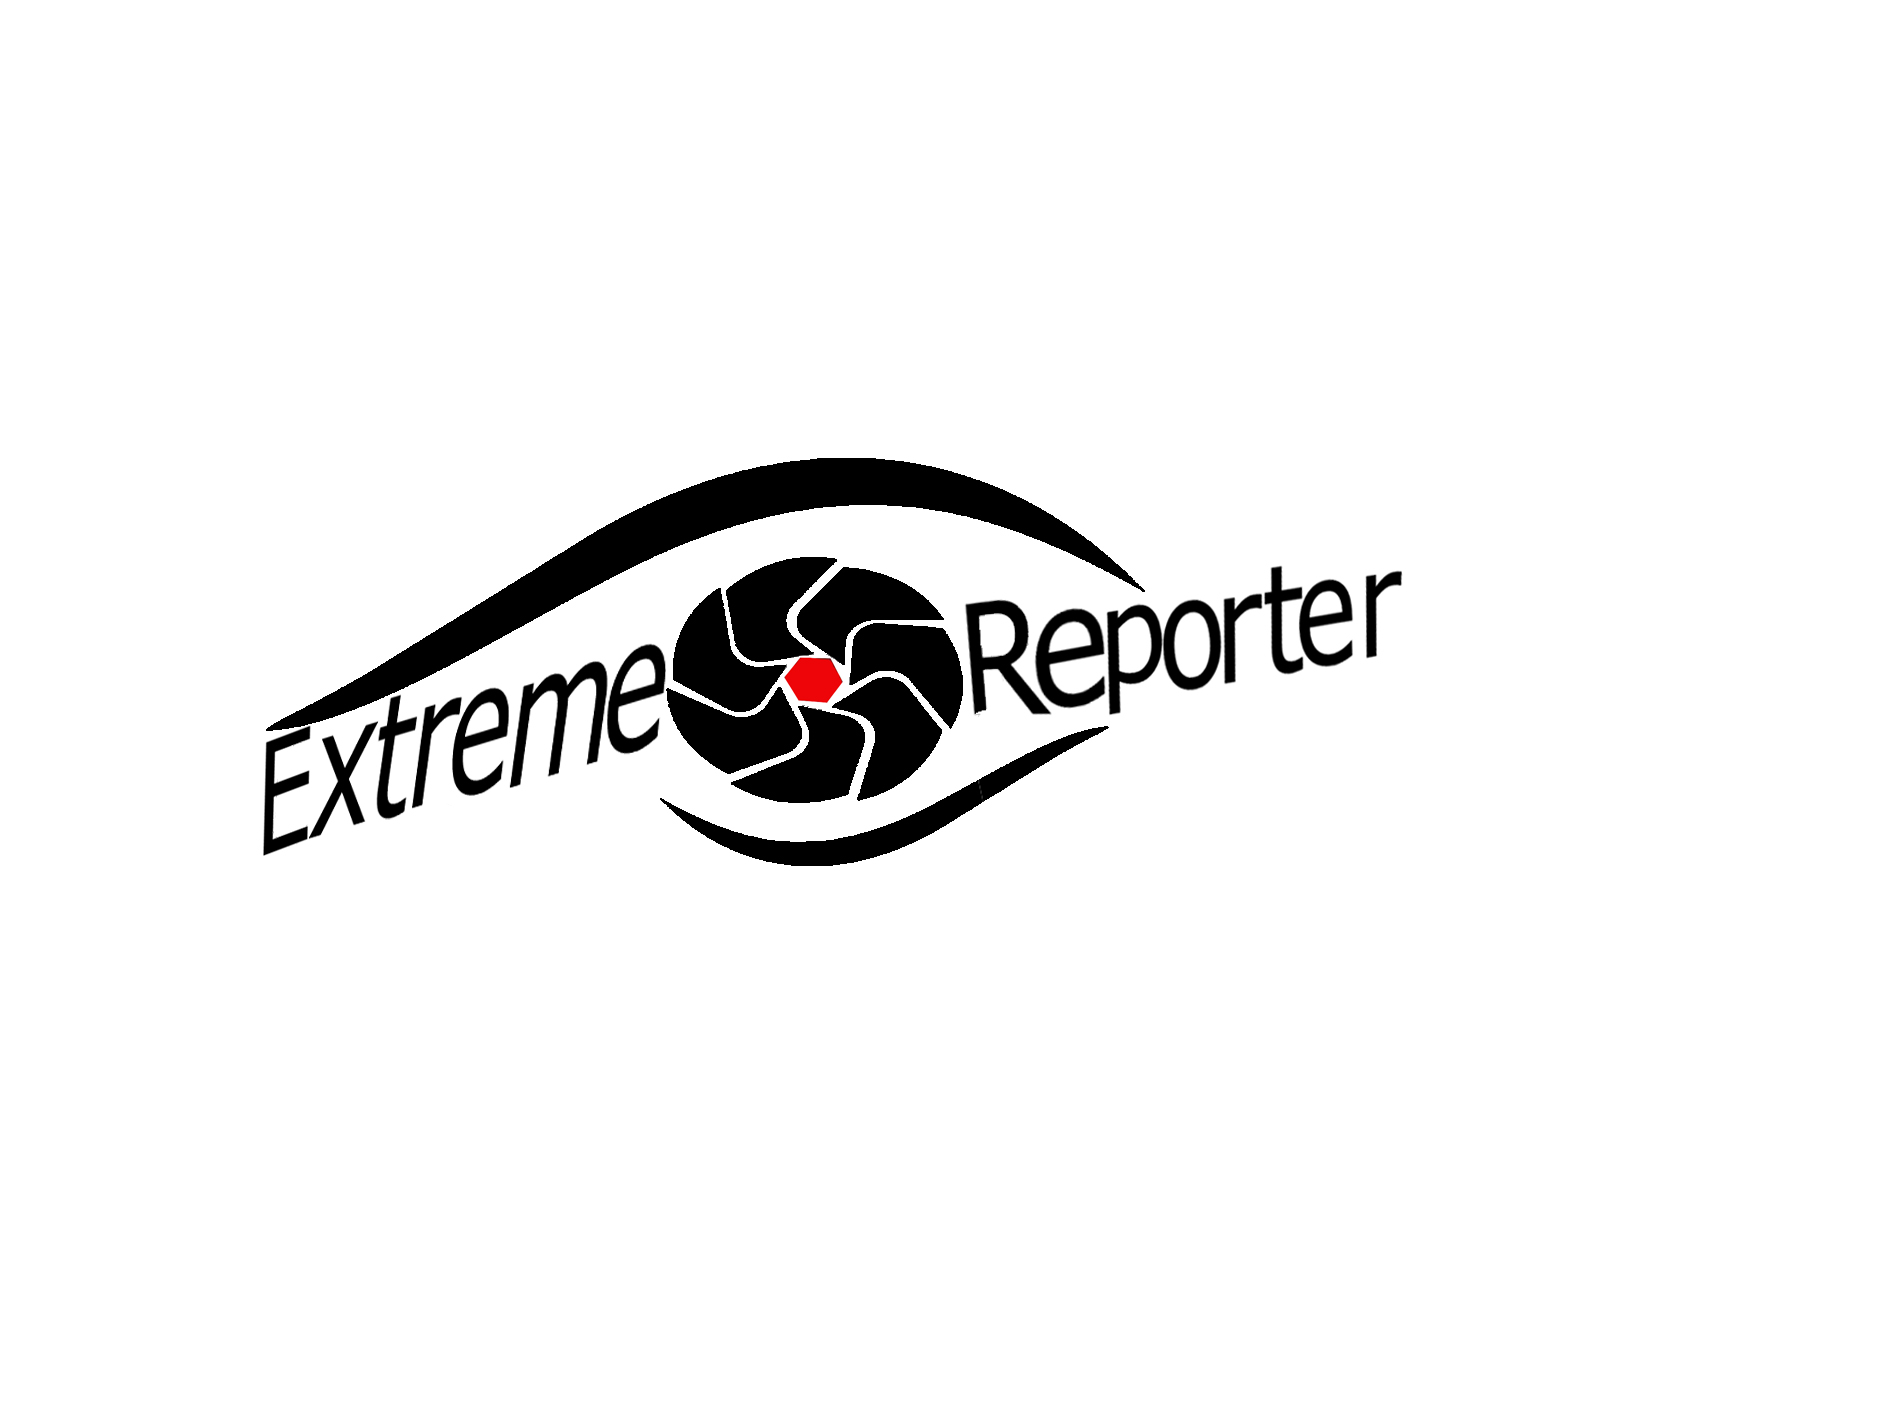 Логотип для экстрим фотографа.  фото f_6275a53c69f84705.jpg